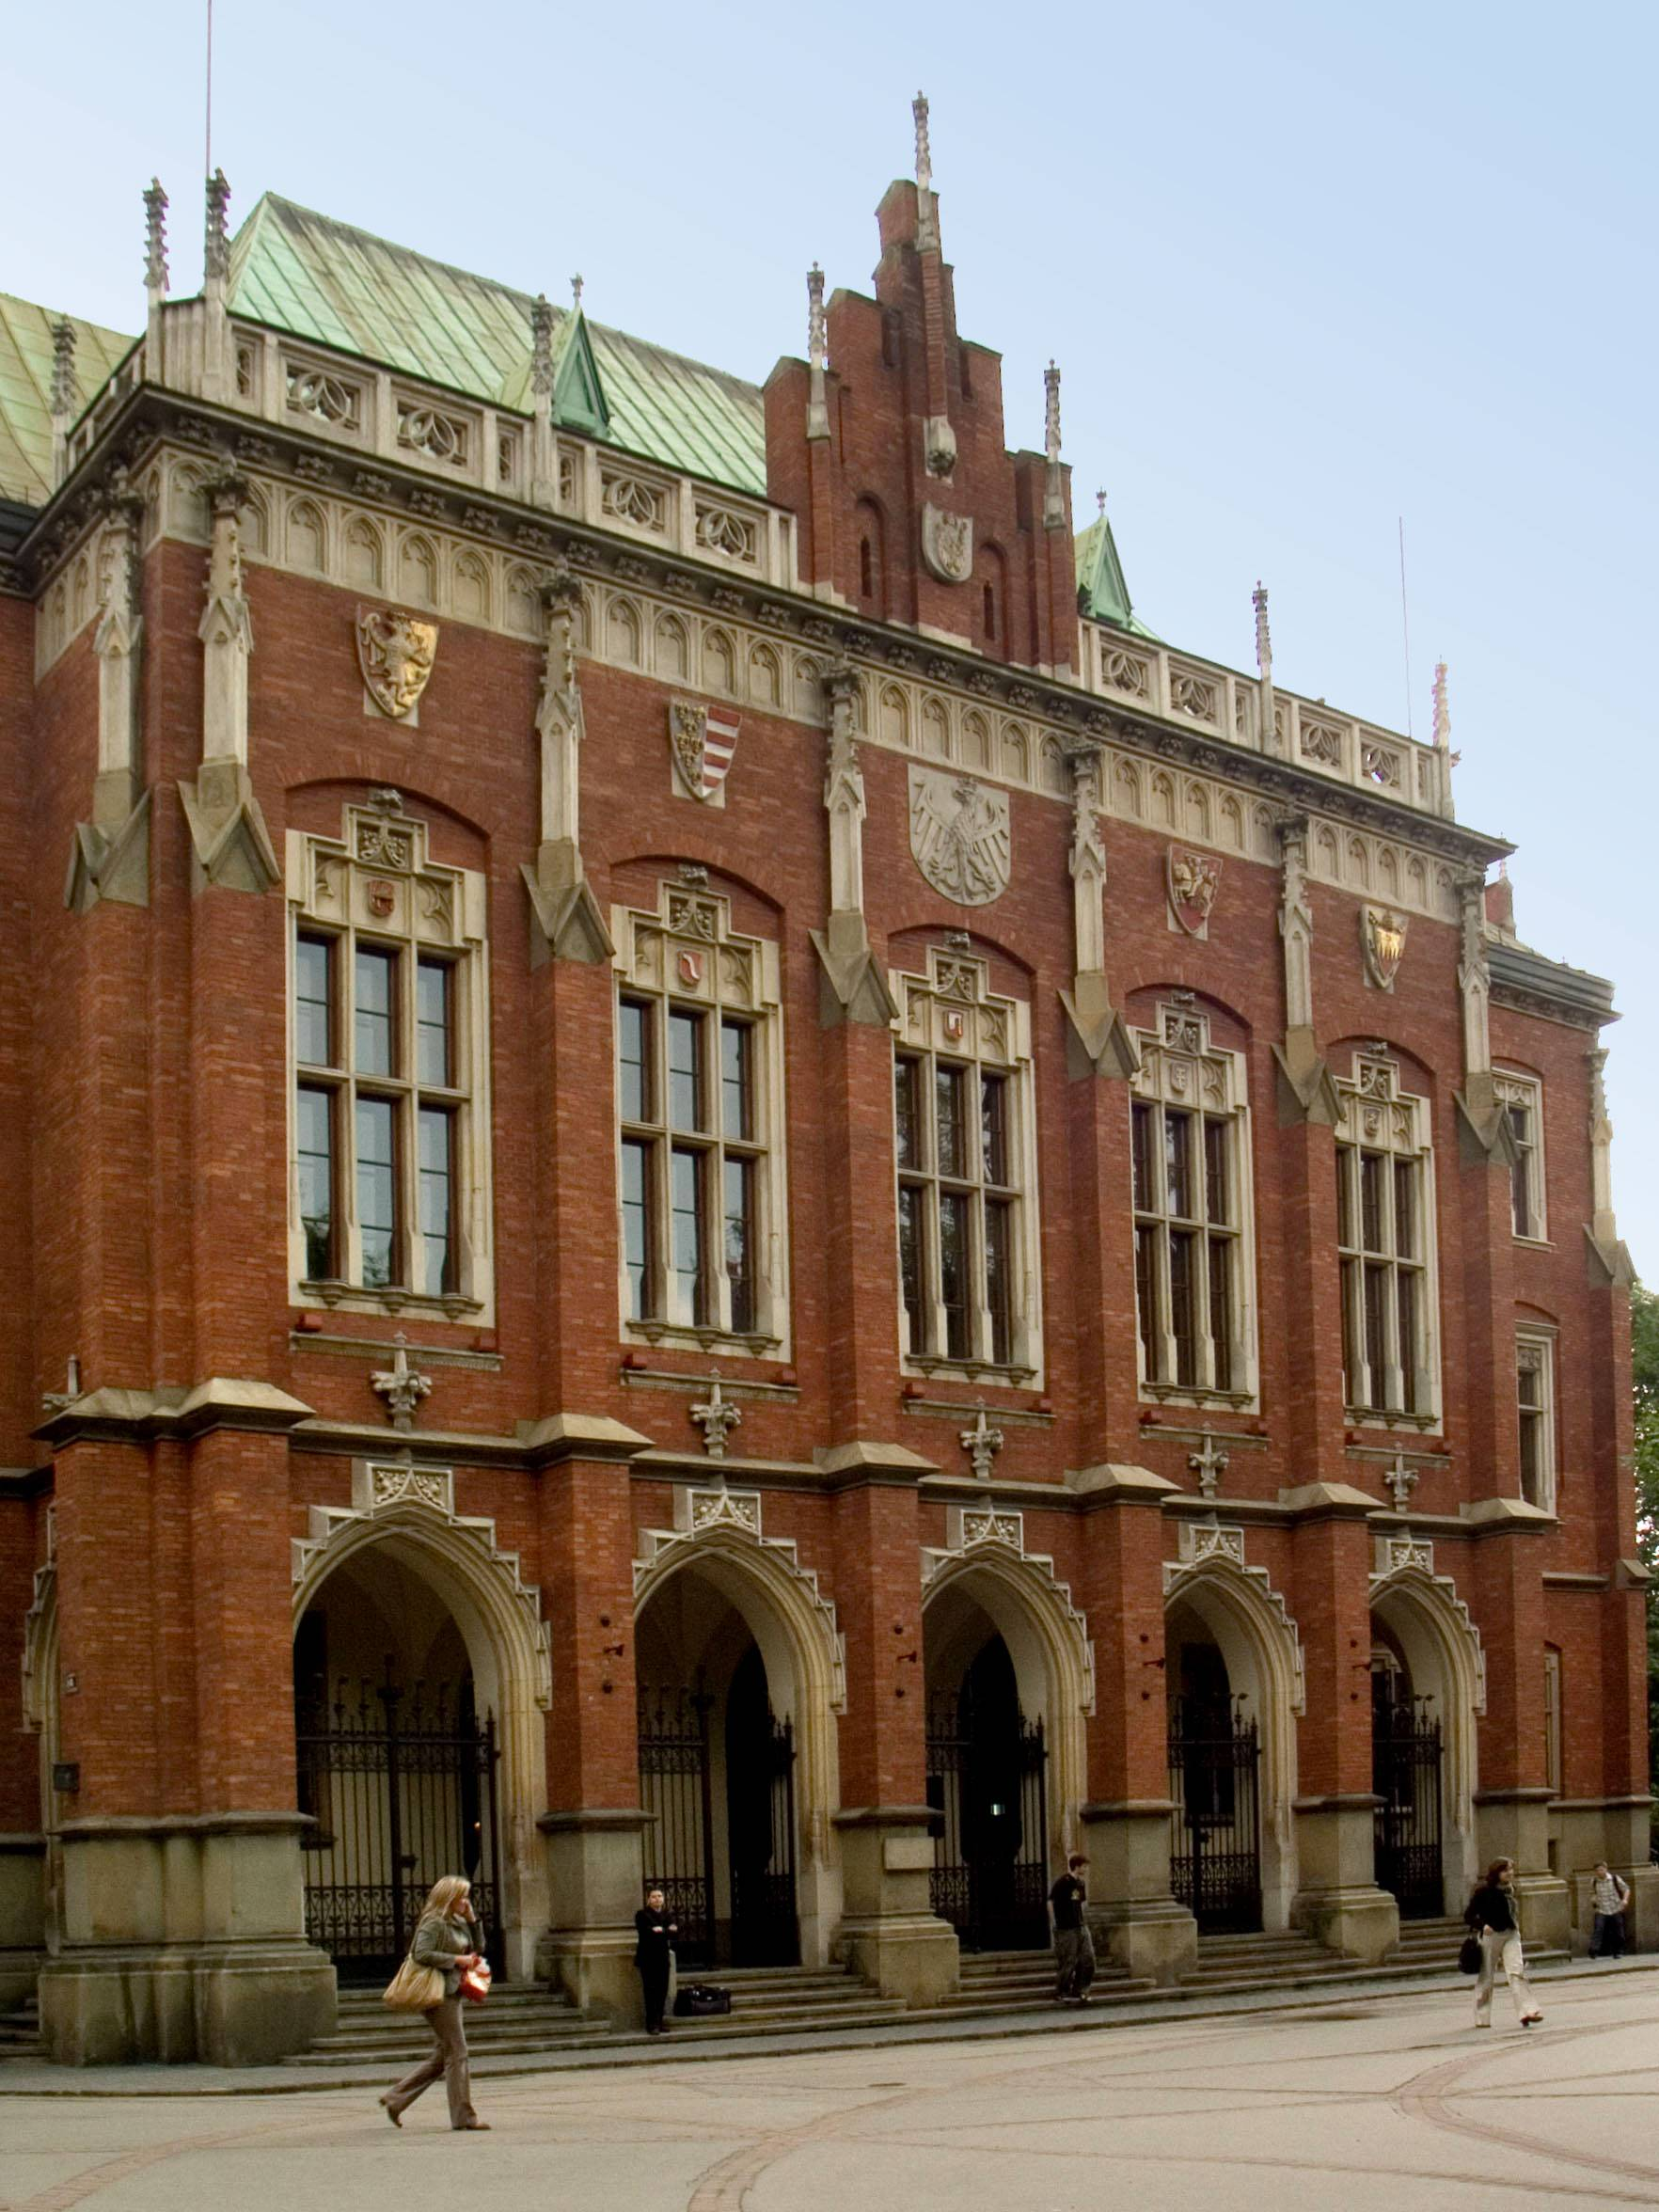 Ягеллонский университет в краковеuniwersytet jagielloński w krakowie